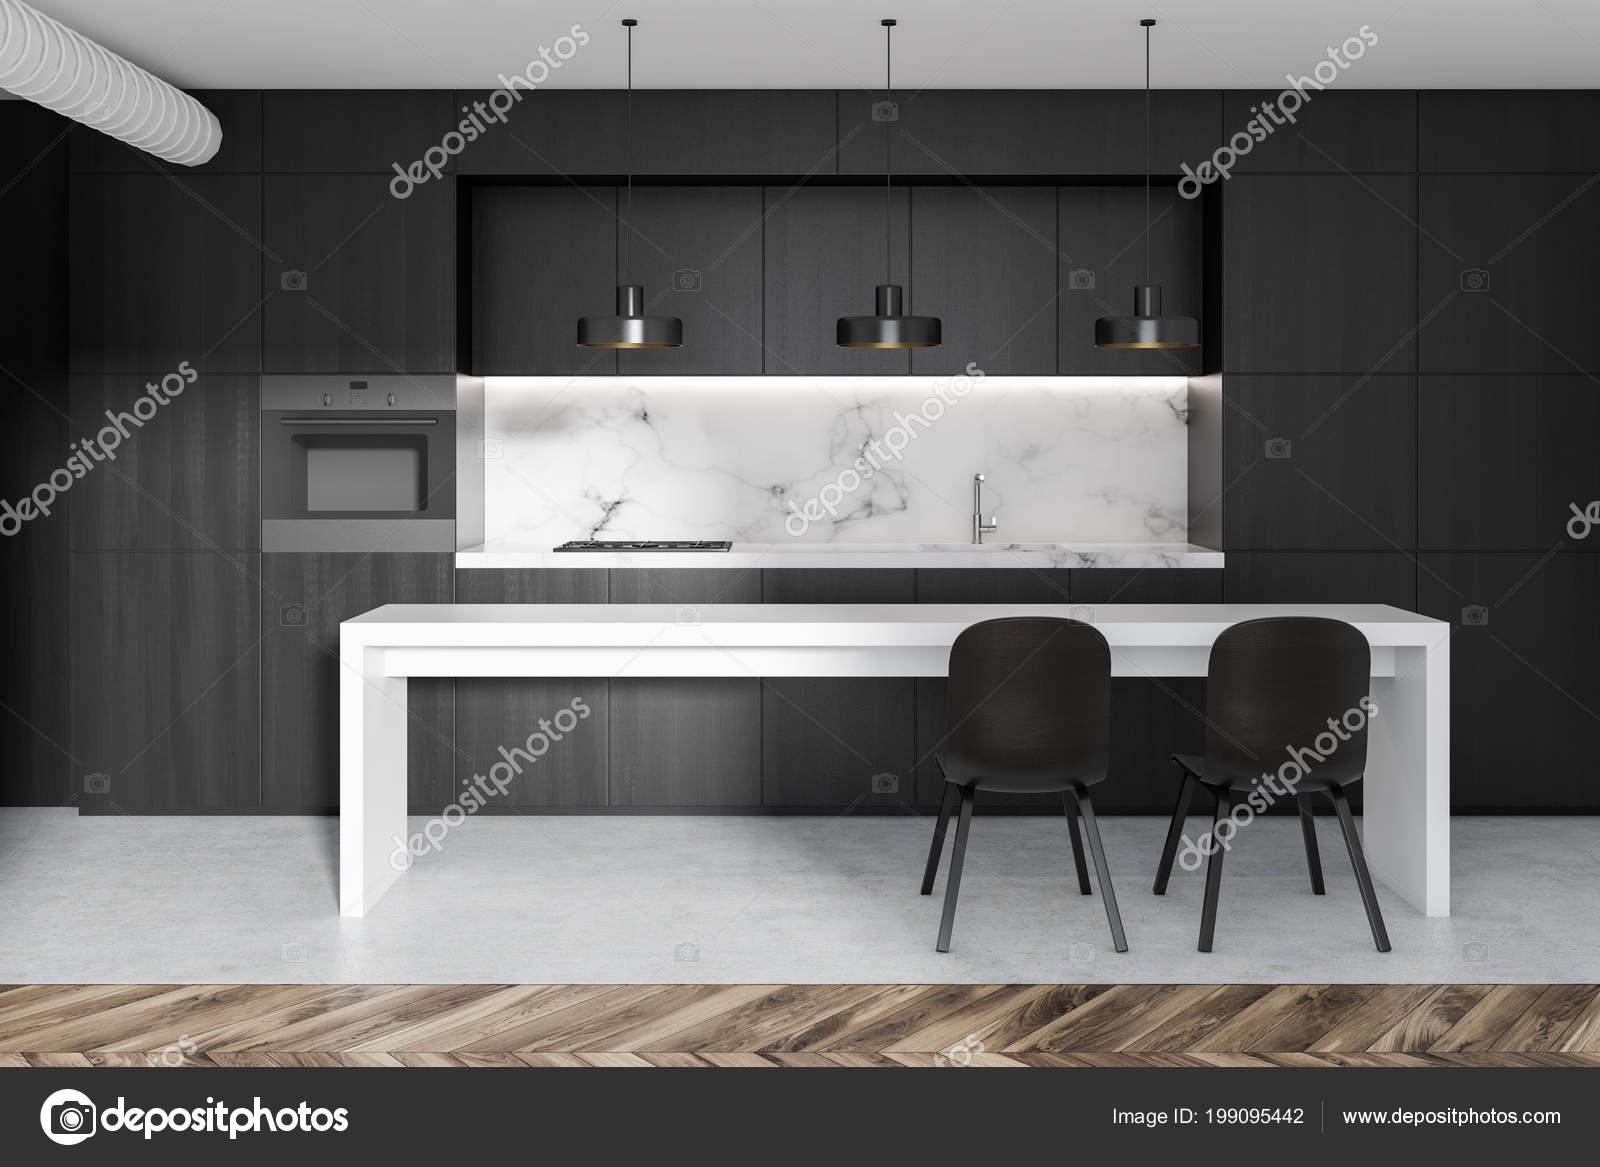 built in kitchen table butterfly undermount sinks 黑色和大理石厨房内饰与黑色台面与内置的家电和一个白色的狭窄桌子与椅子 3d 渲染模拟 照片作者denisismagilov